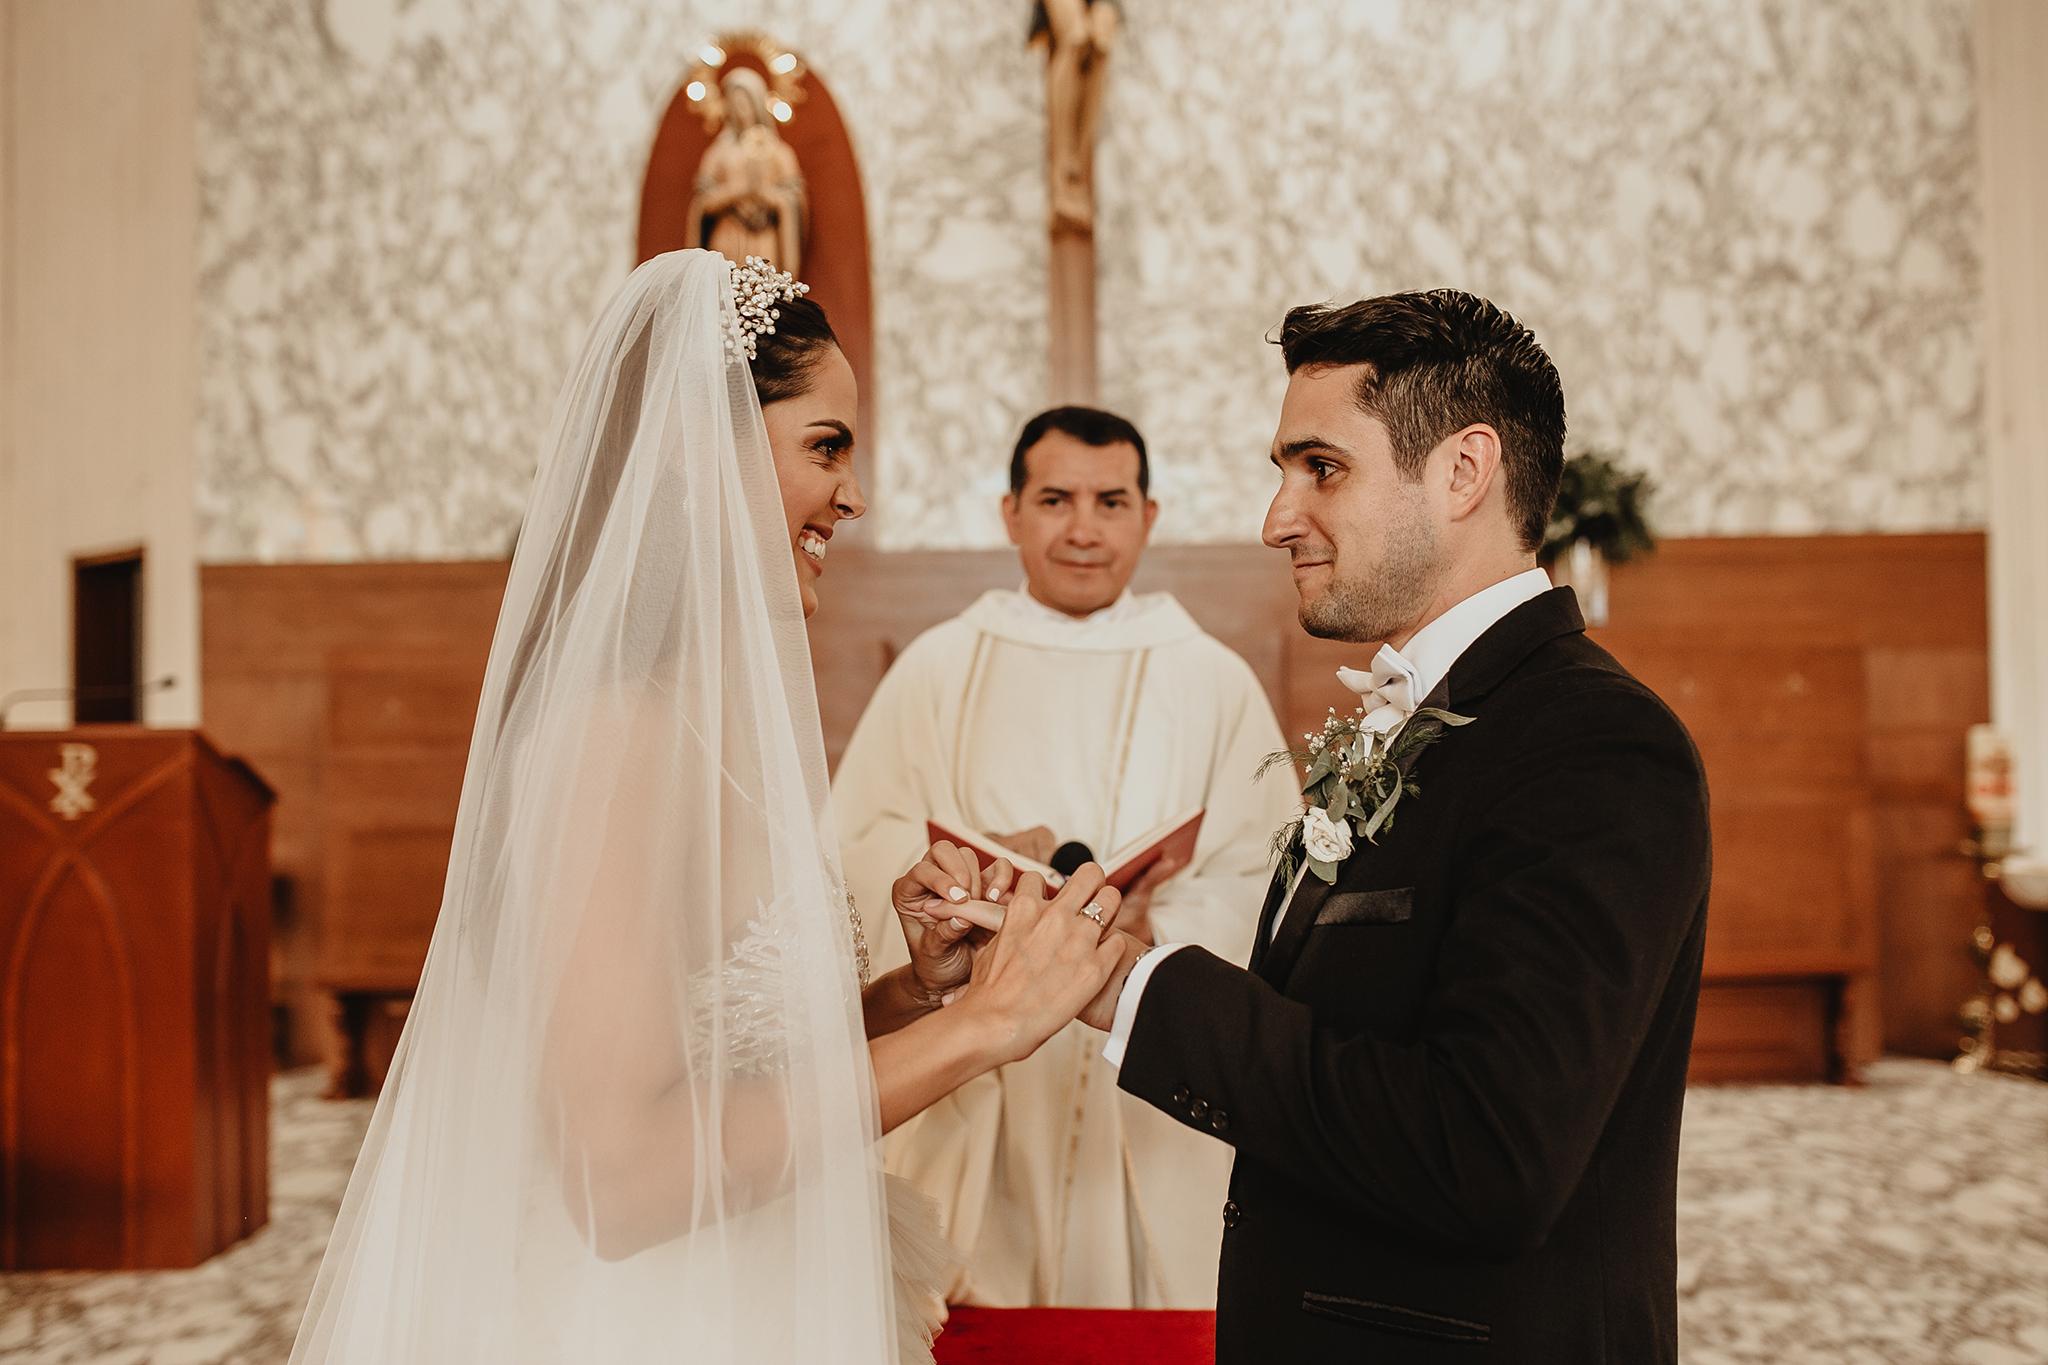 0661R&F__WeddingDestination_Weddingmerida_BodaMexico_FotografoDeBodas_FabrizioSimoneenFotografo.jpg